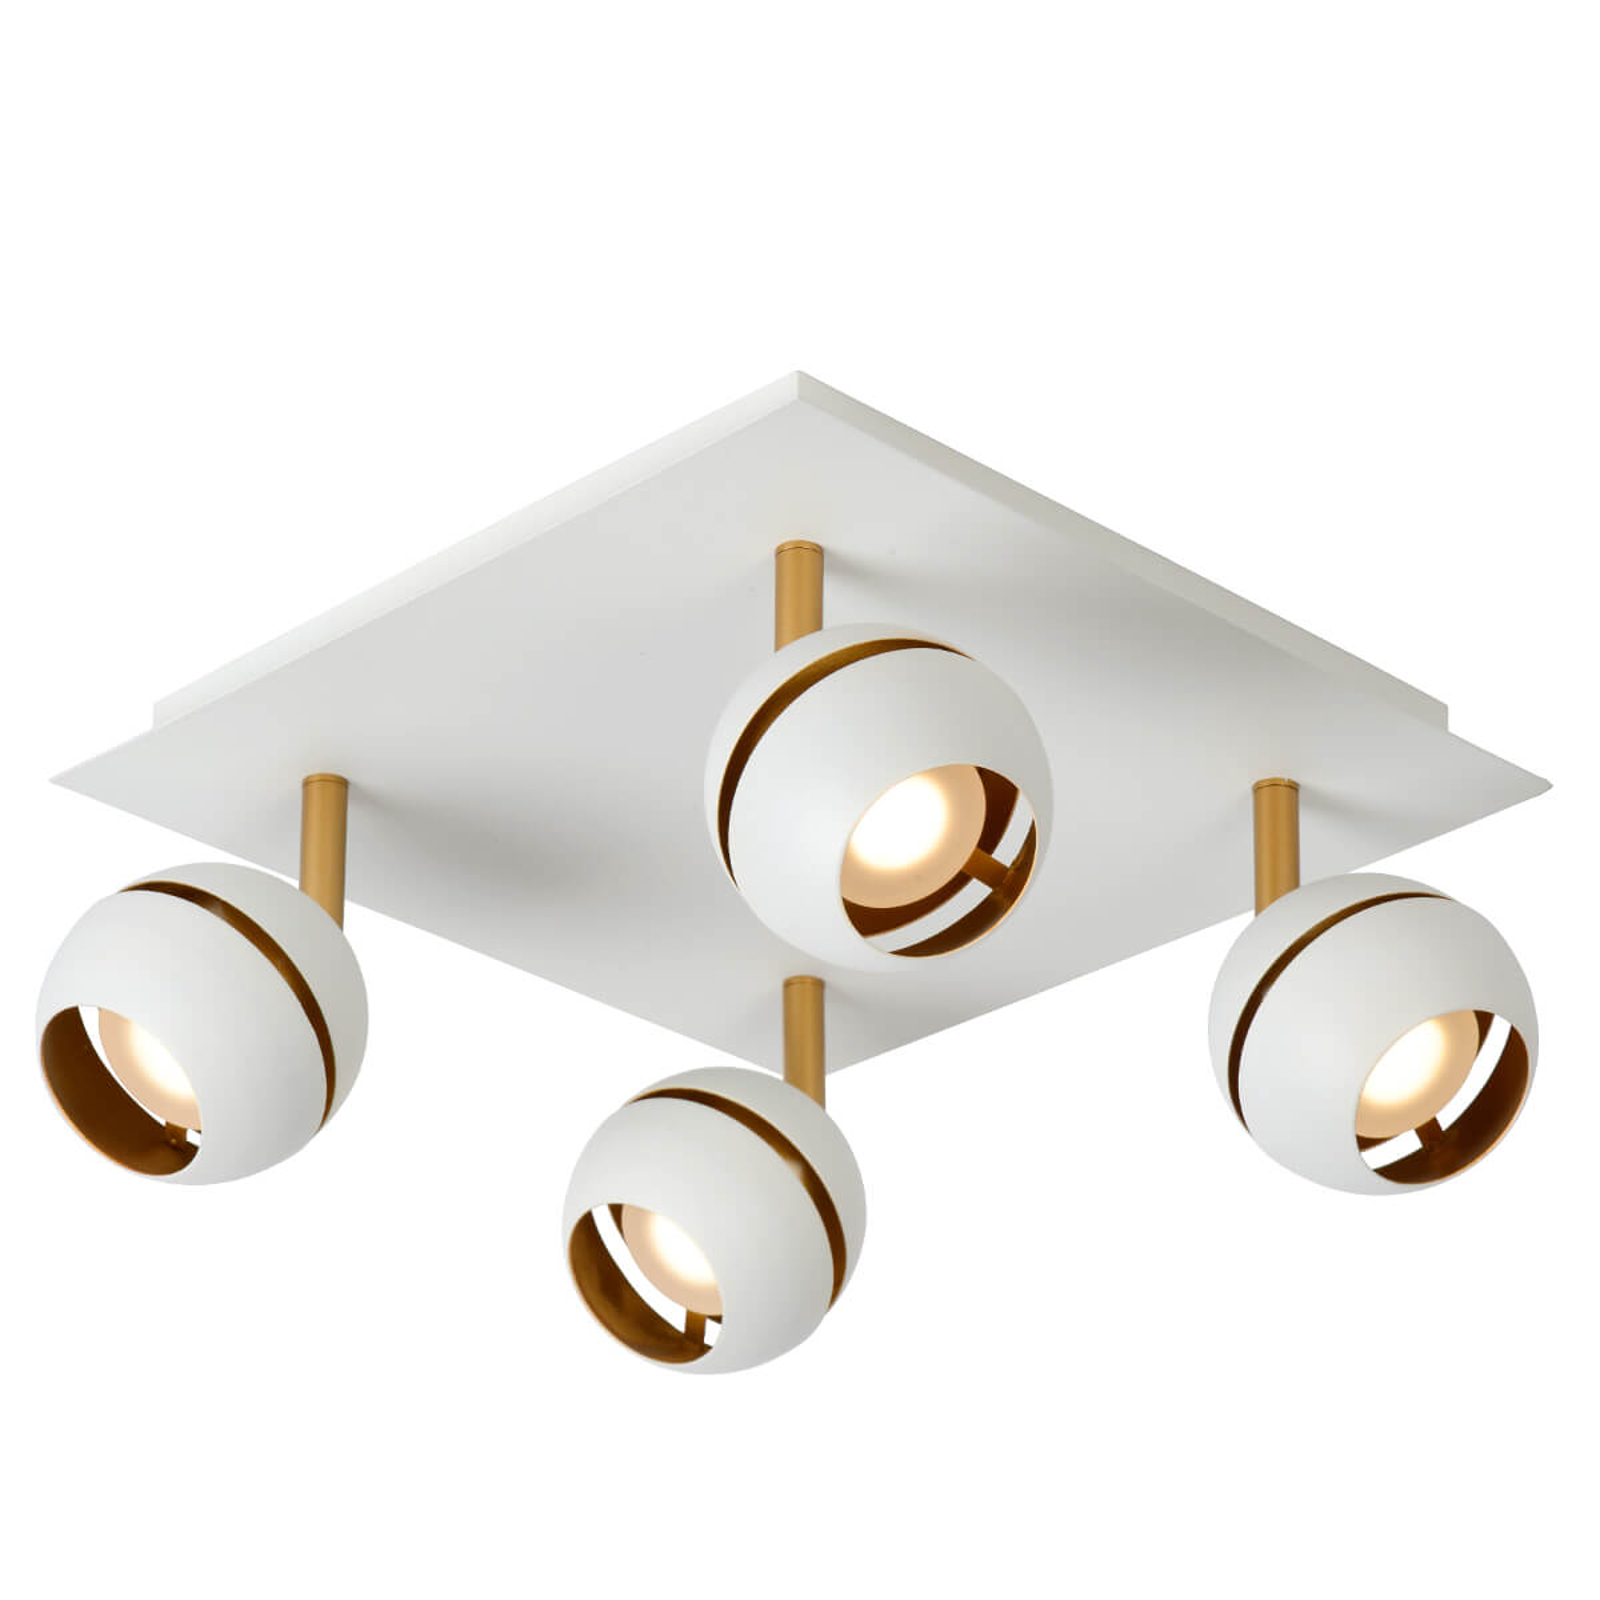 LED-loftslampen Binari i hvid, 4 lyskilder